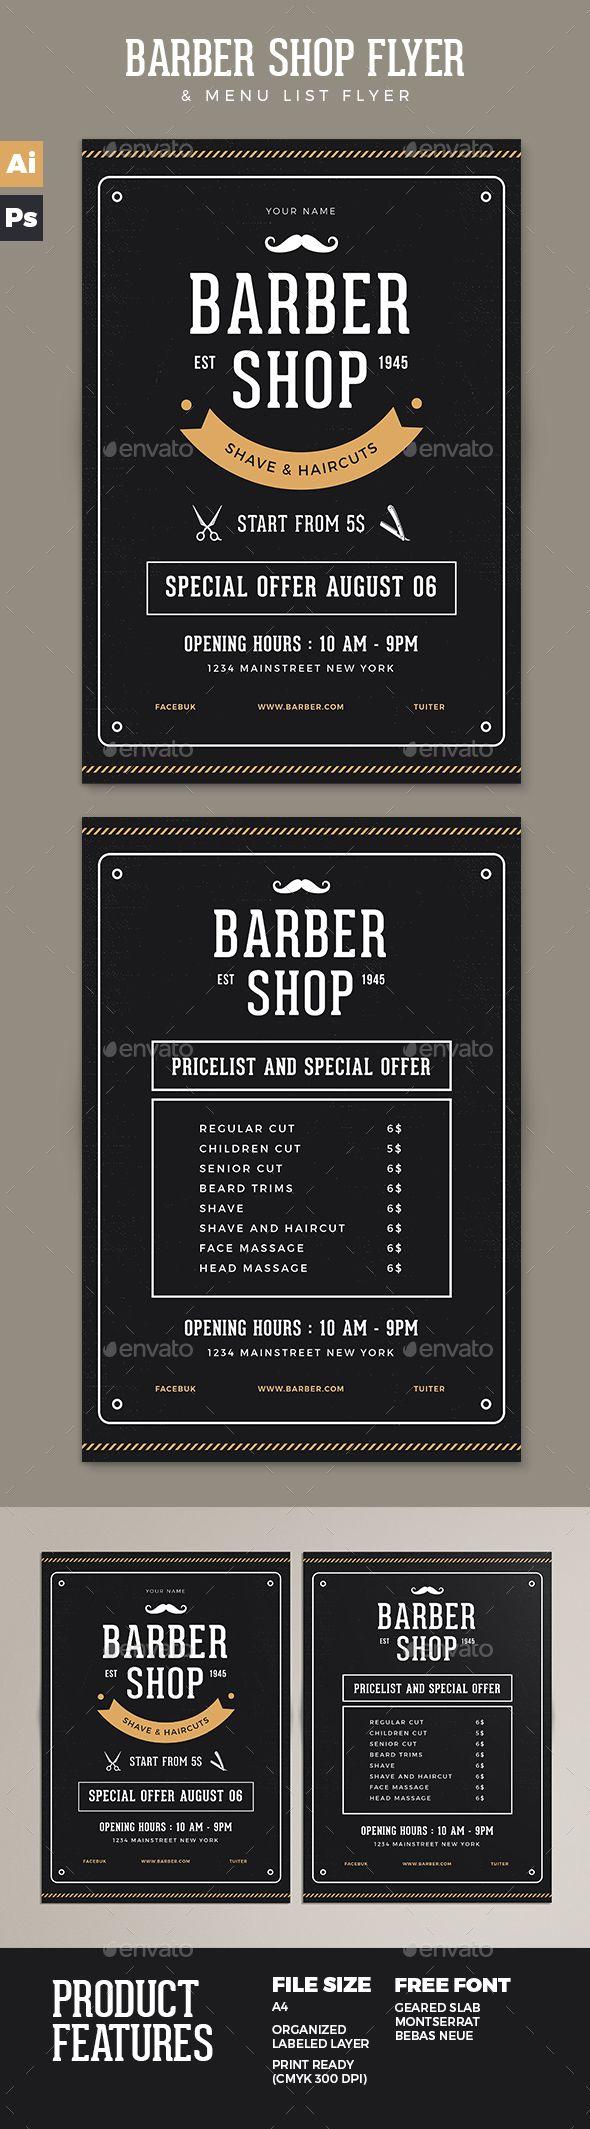 Barber Shop Flyer Template PSD, AI Illustrator. Download here…